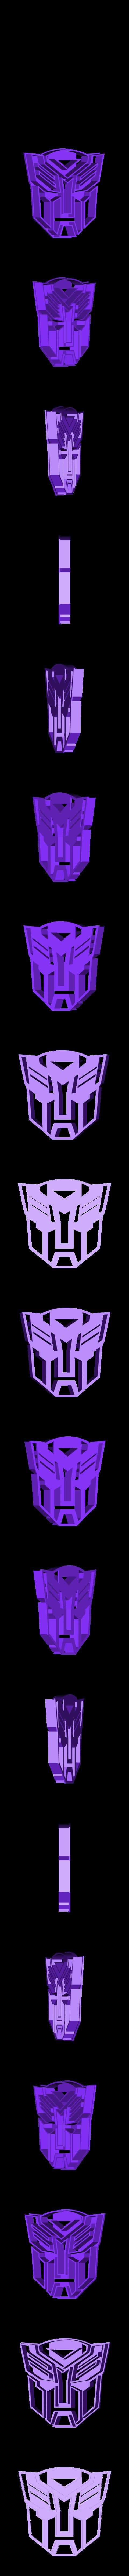 trasformer 2.stl Download STL file Transformer • 3D printer template, arprint3d